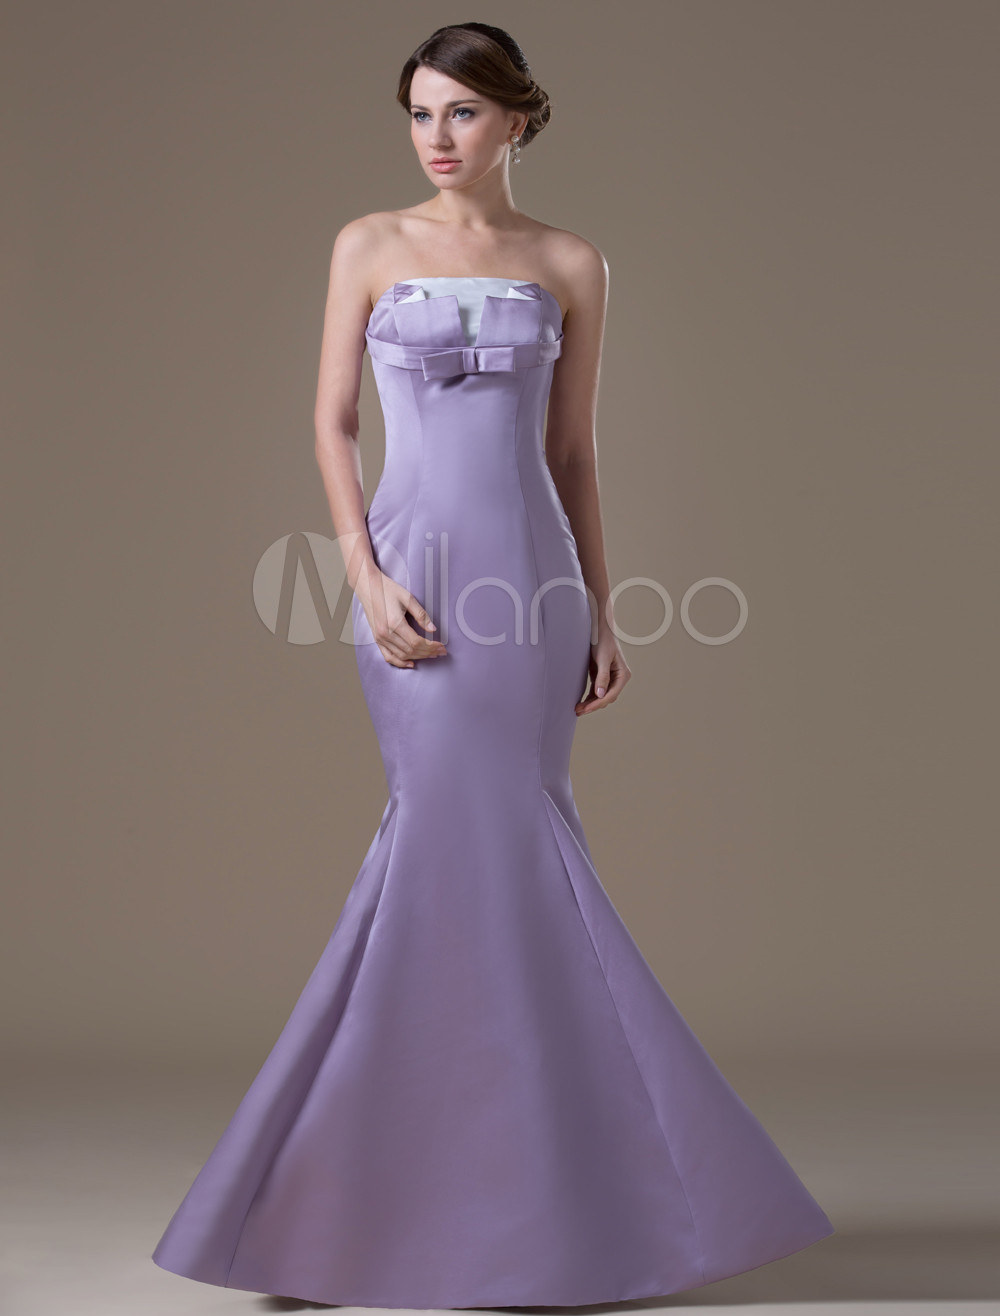 Fashion Light Purple Satin A-line Maternity Bridesmaid Dress